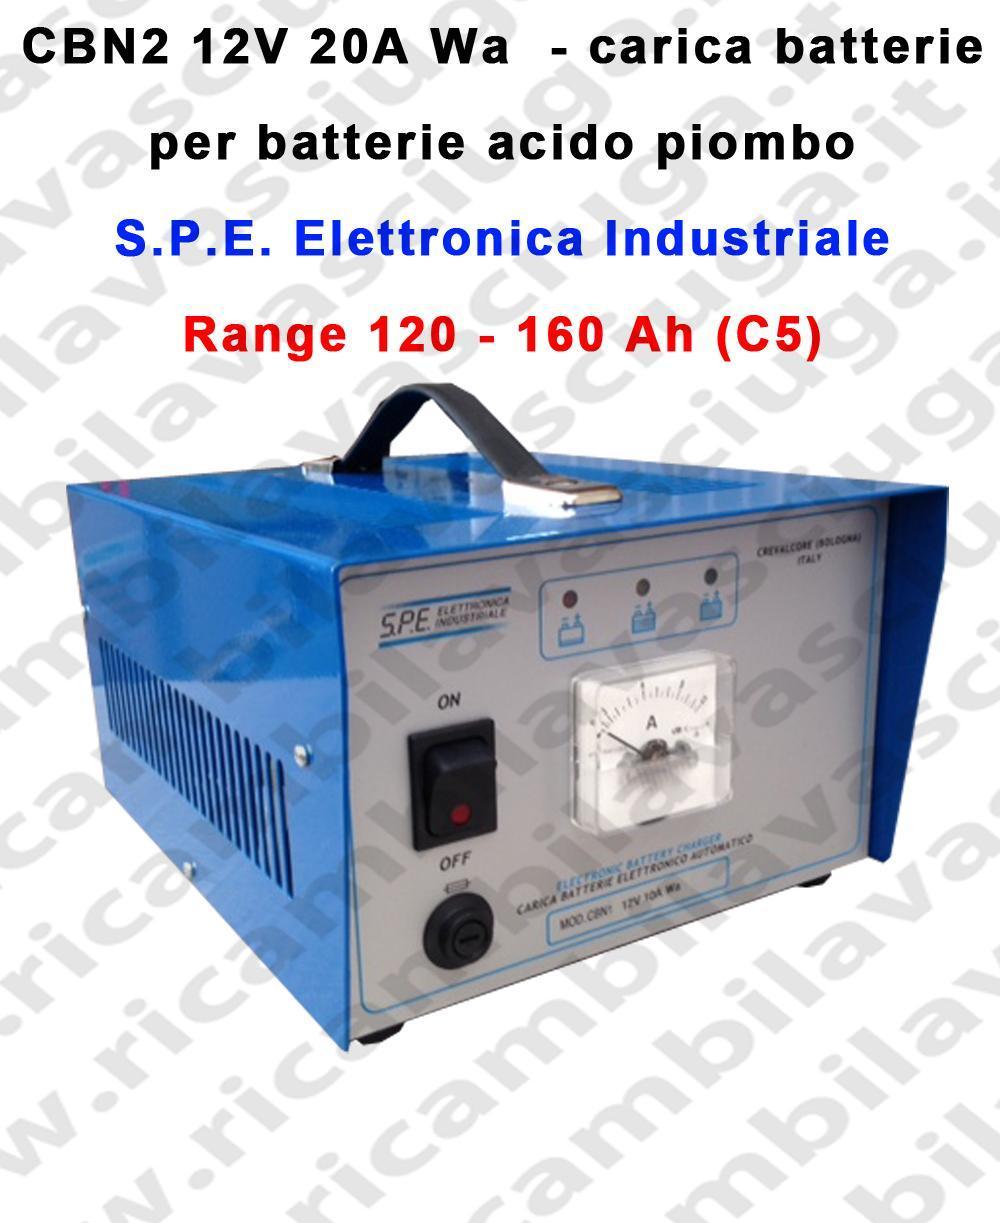 CBN2 12V 20A Wa Batterieladung für Blei-Säure-Batterie S.P.E. Elettronica Industriale